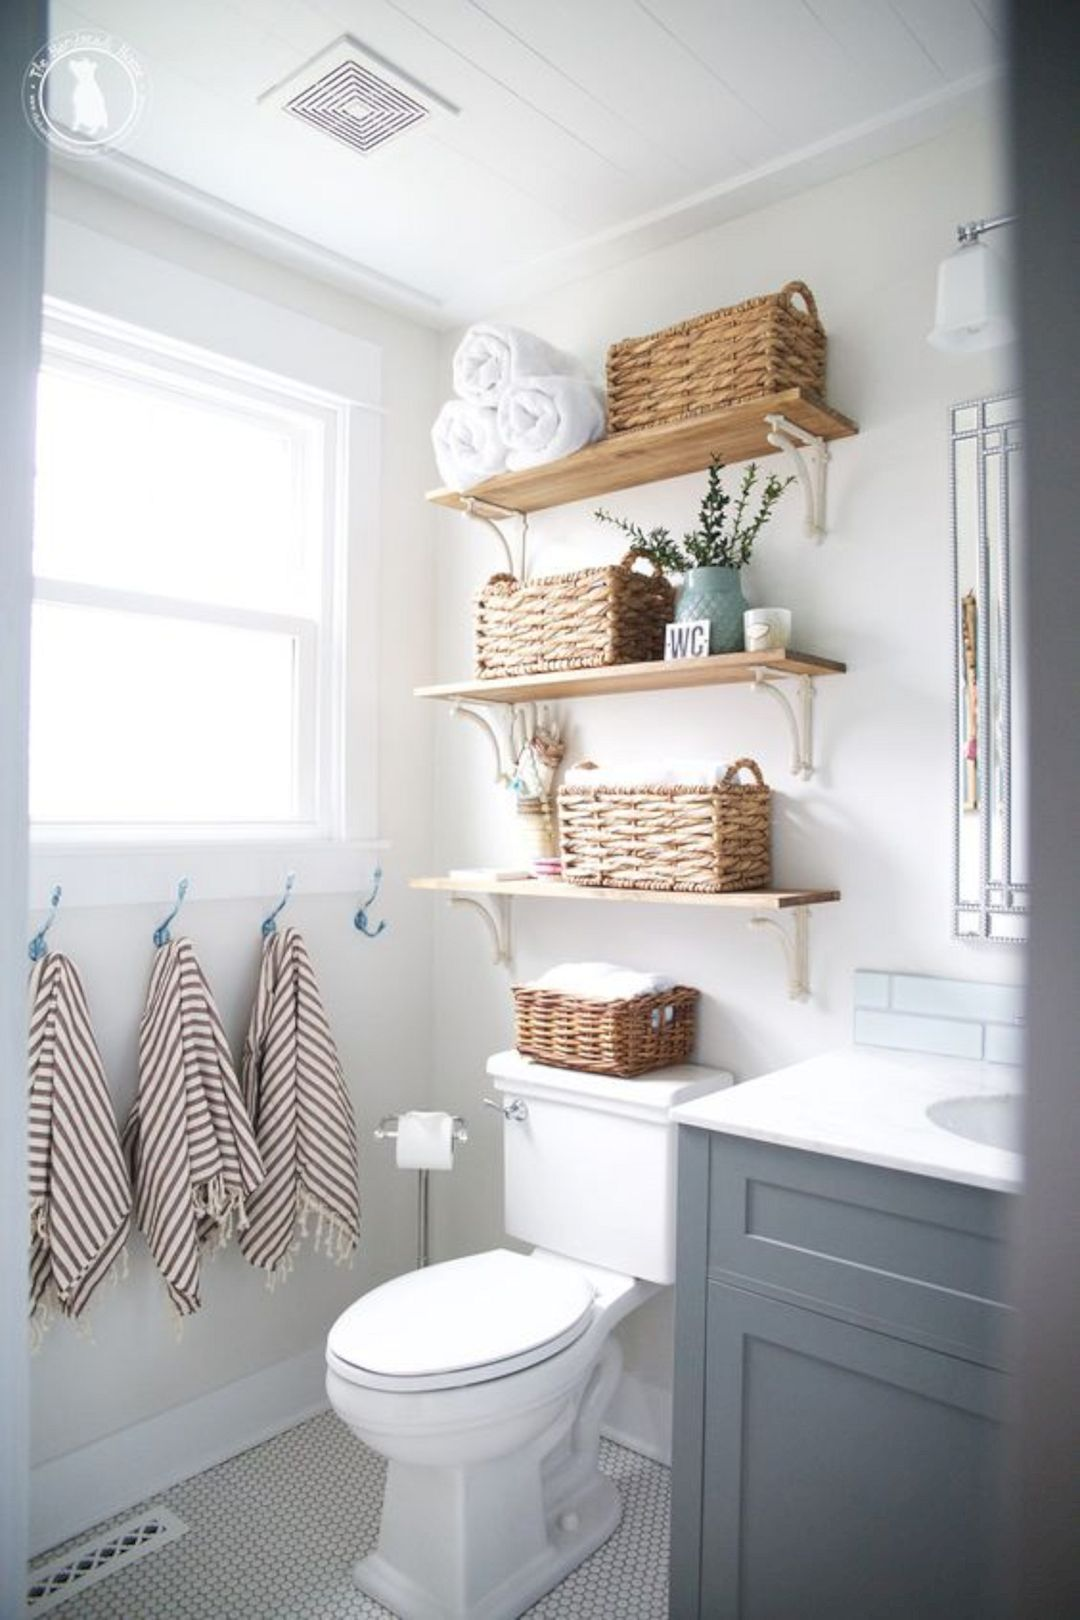 Delicieux 16 Small Bathroom Renovation Ideas  Https://www.futuristarchitecture.com/33113